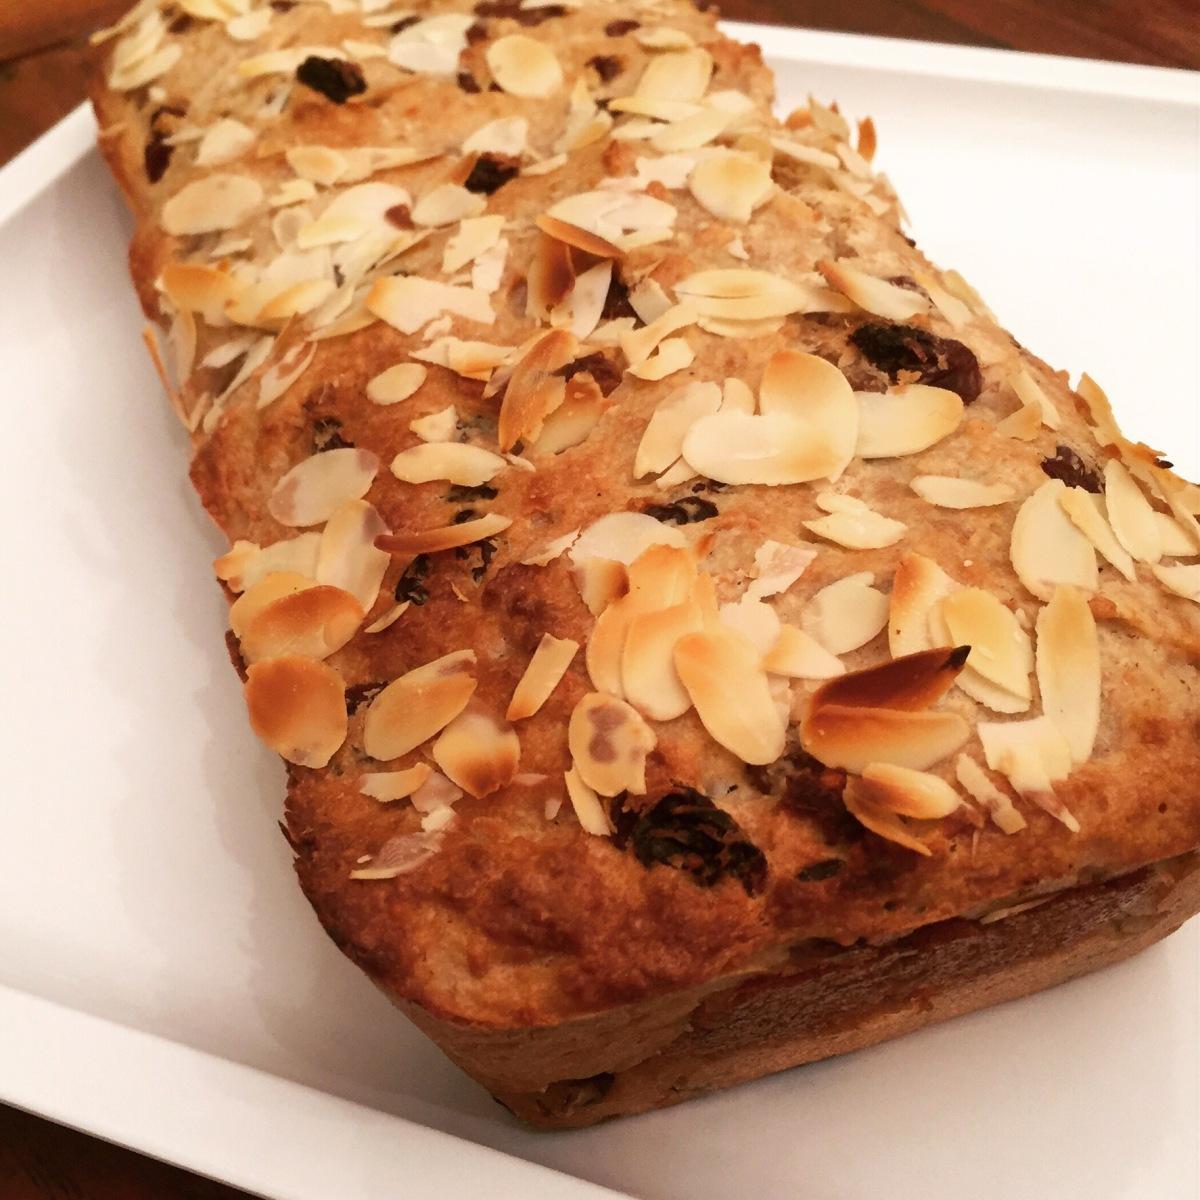 Vegan Paasbrood of Paaskwarkbrood met spijs